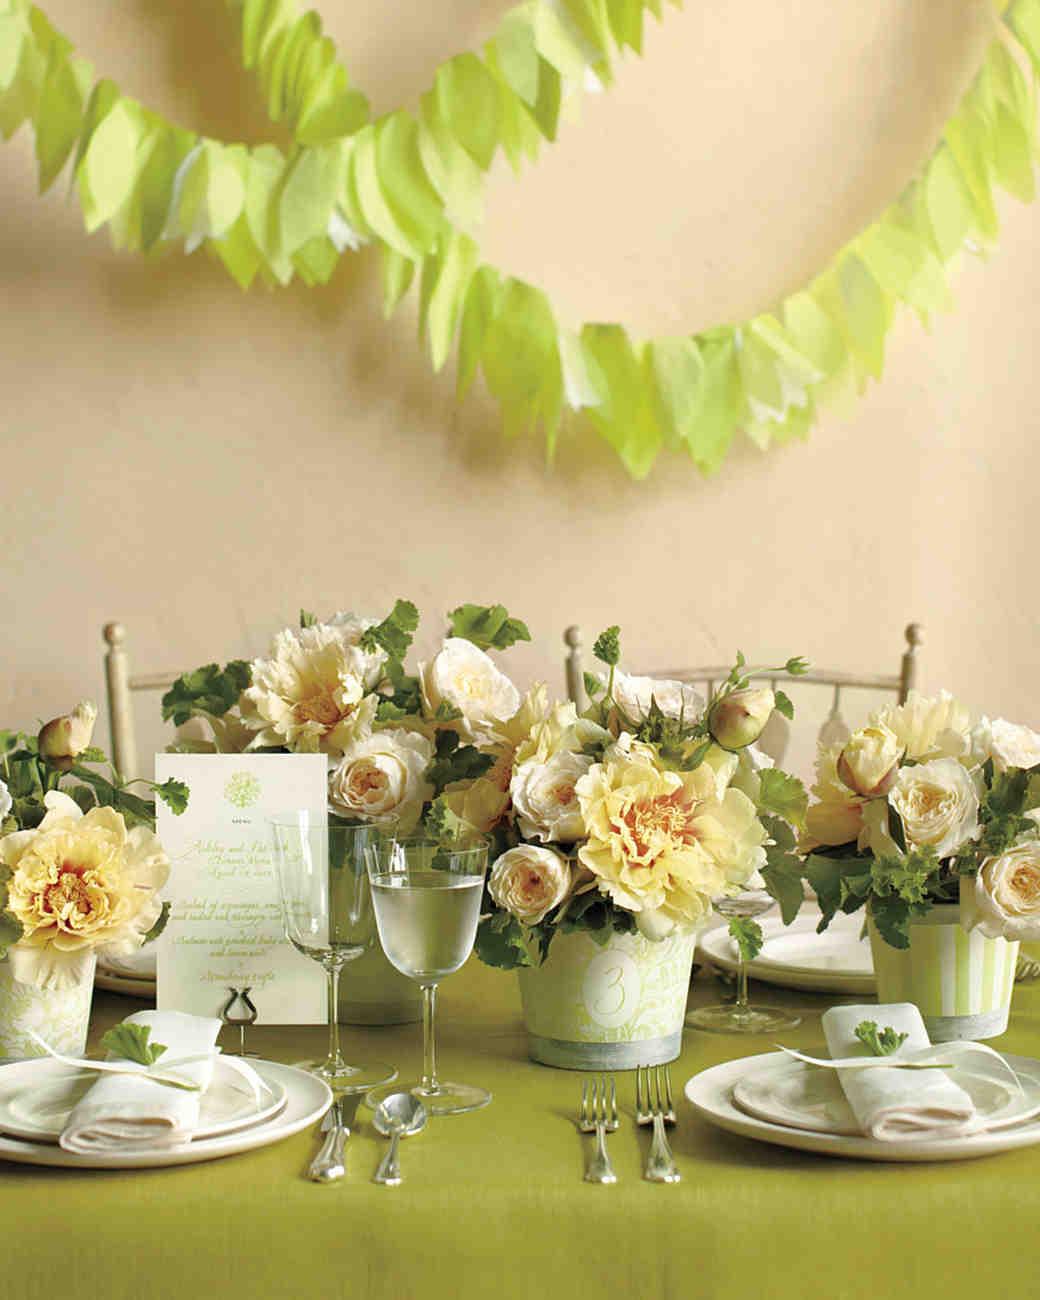 clip-art-garden-party-mwd107615.jpg